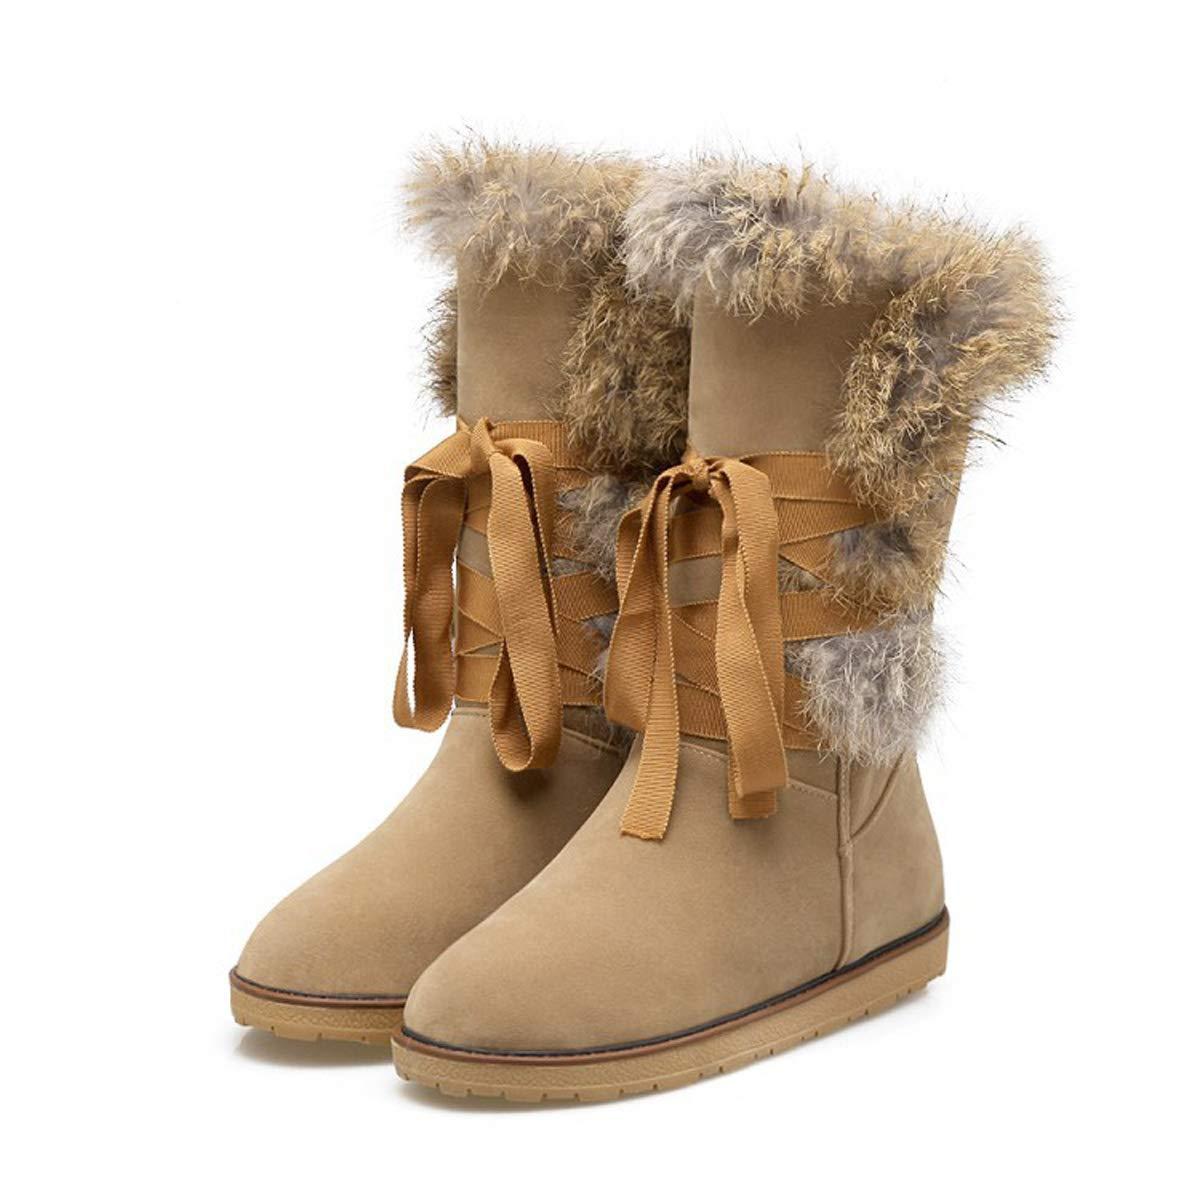 DANDANJIE damen Schnee Stiefel Wasserdichte Winter warme mittlere Wade Stiefel Rutschfeste Lace Up High Top Schuhe A 40EU